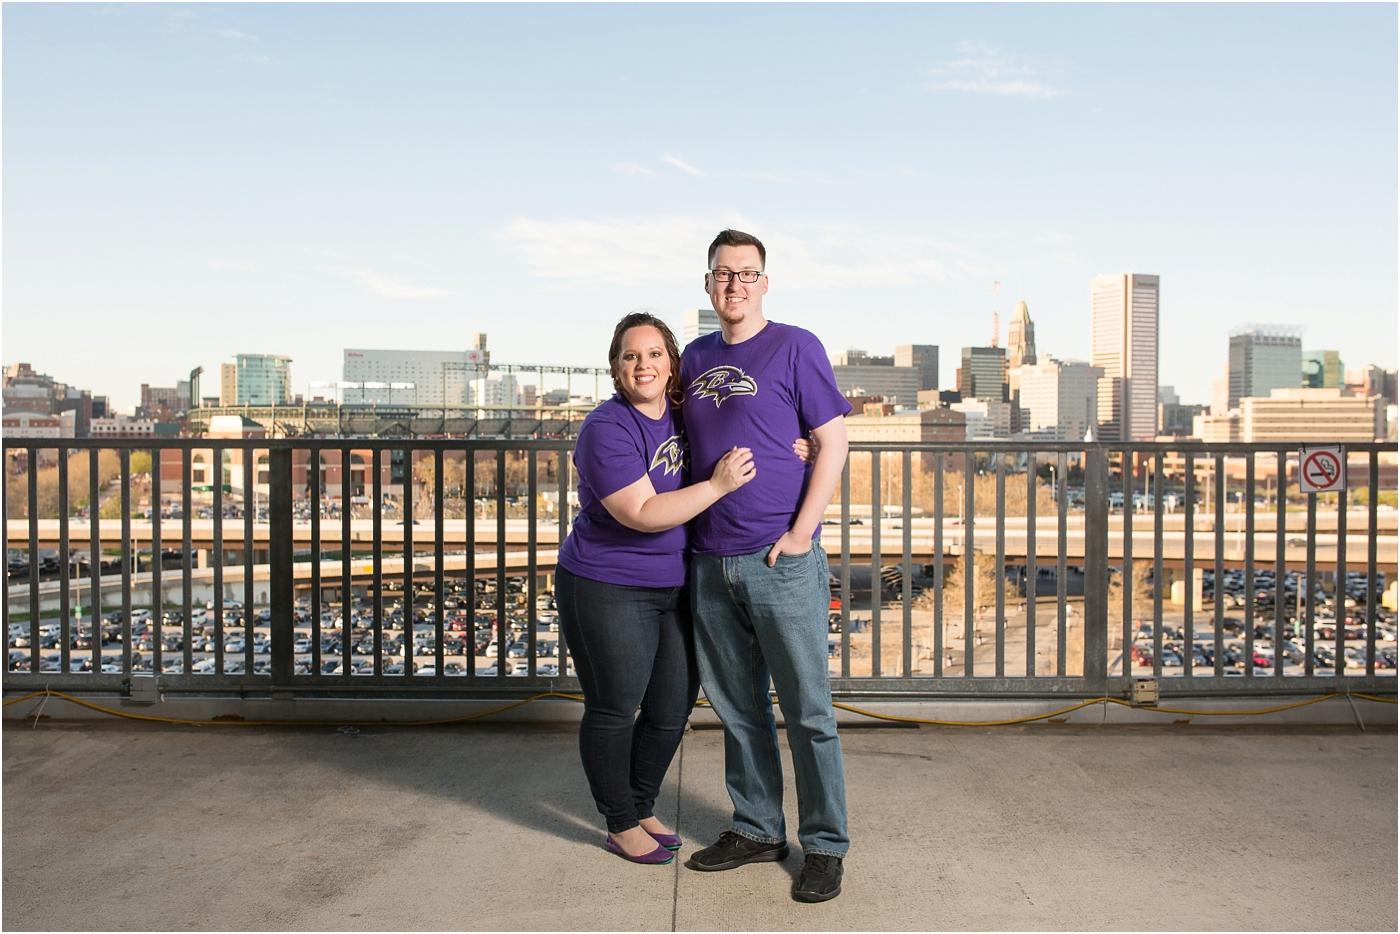 Ravens-Stadium-Engagement-Photos-39.jpg